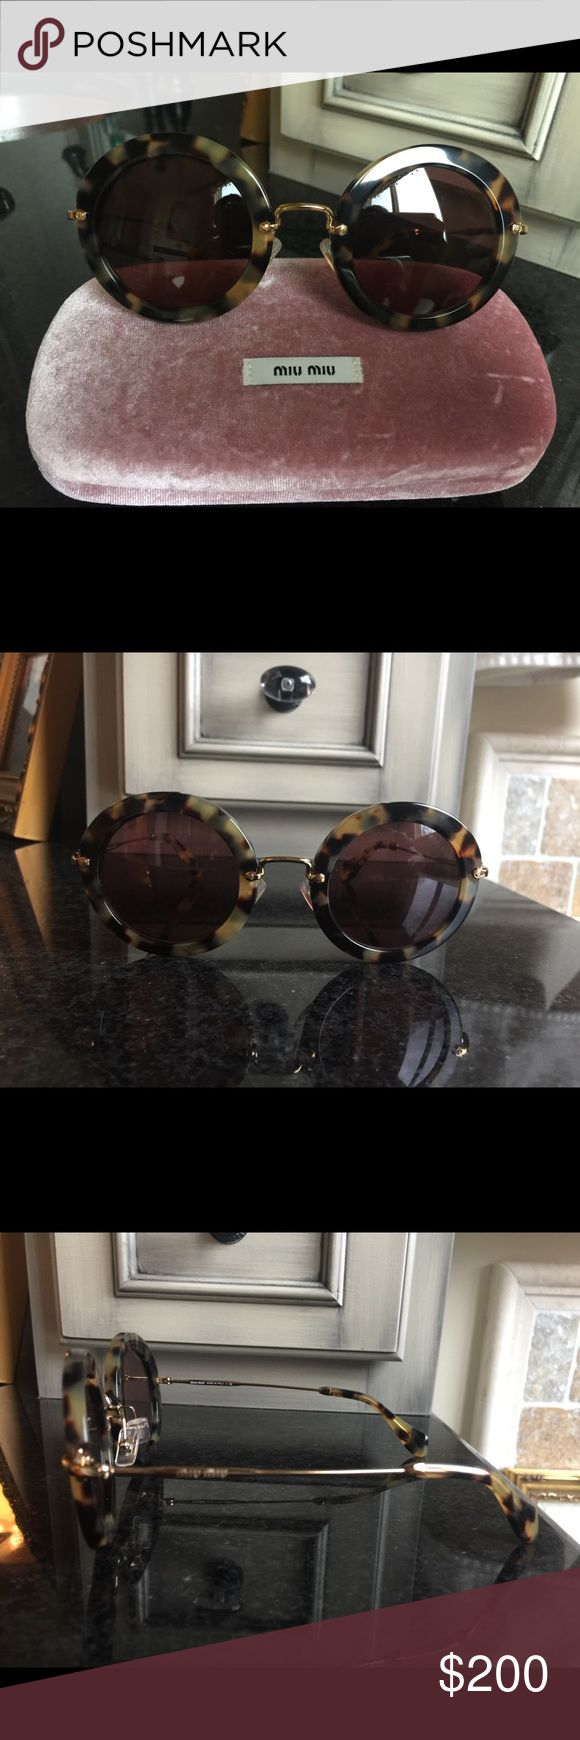 New! Miu Miu Tortoise Shell sunglasses Miu Miu (by Prada) lightweight & very fashionable oversized round sunglasses. New Accessories Sunglasses